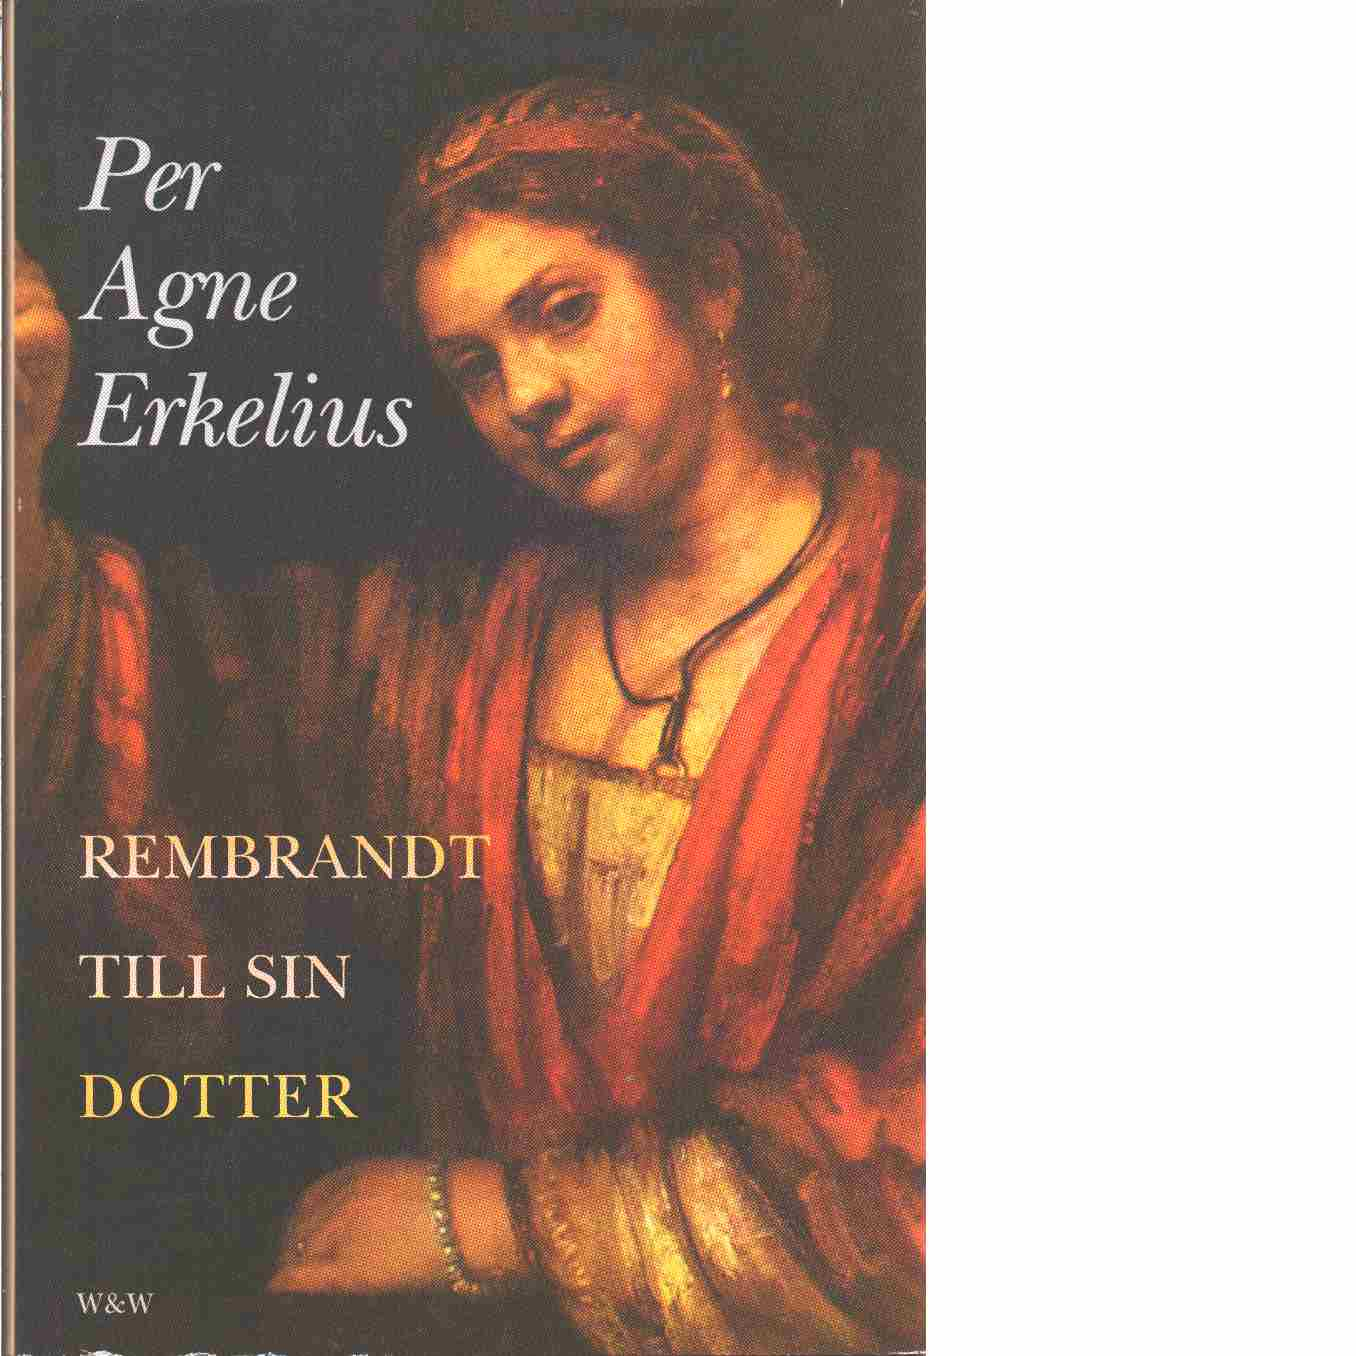 Rembrandt till sin dotter - Erkelius, Per Agne